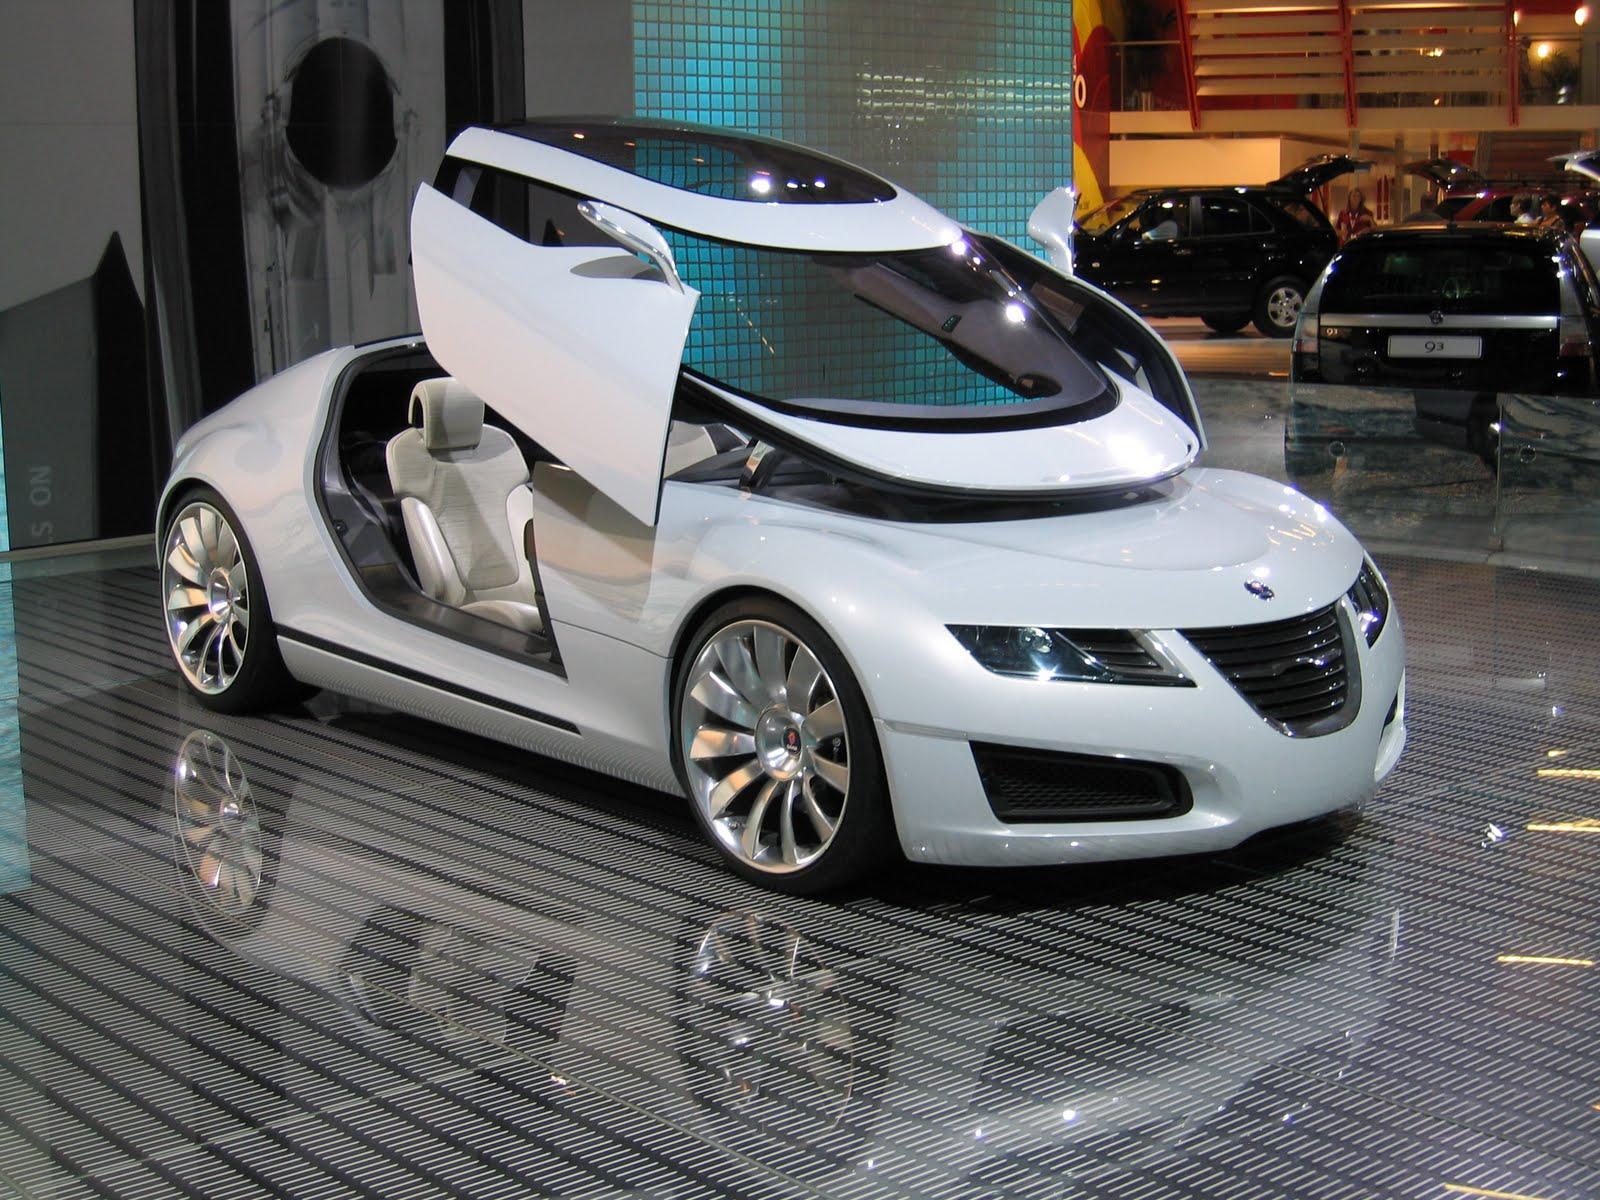 amazing cars hd 8